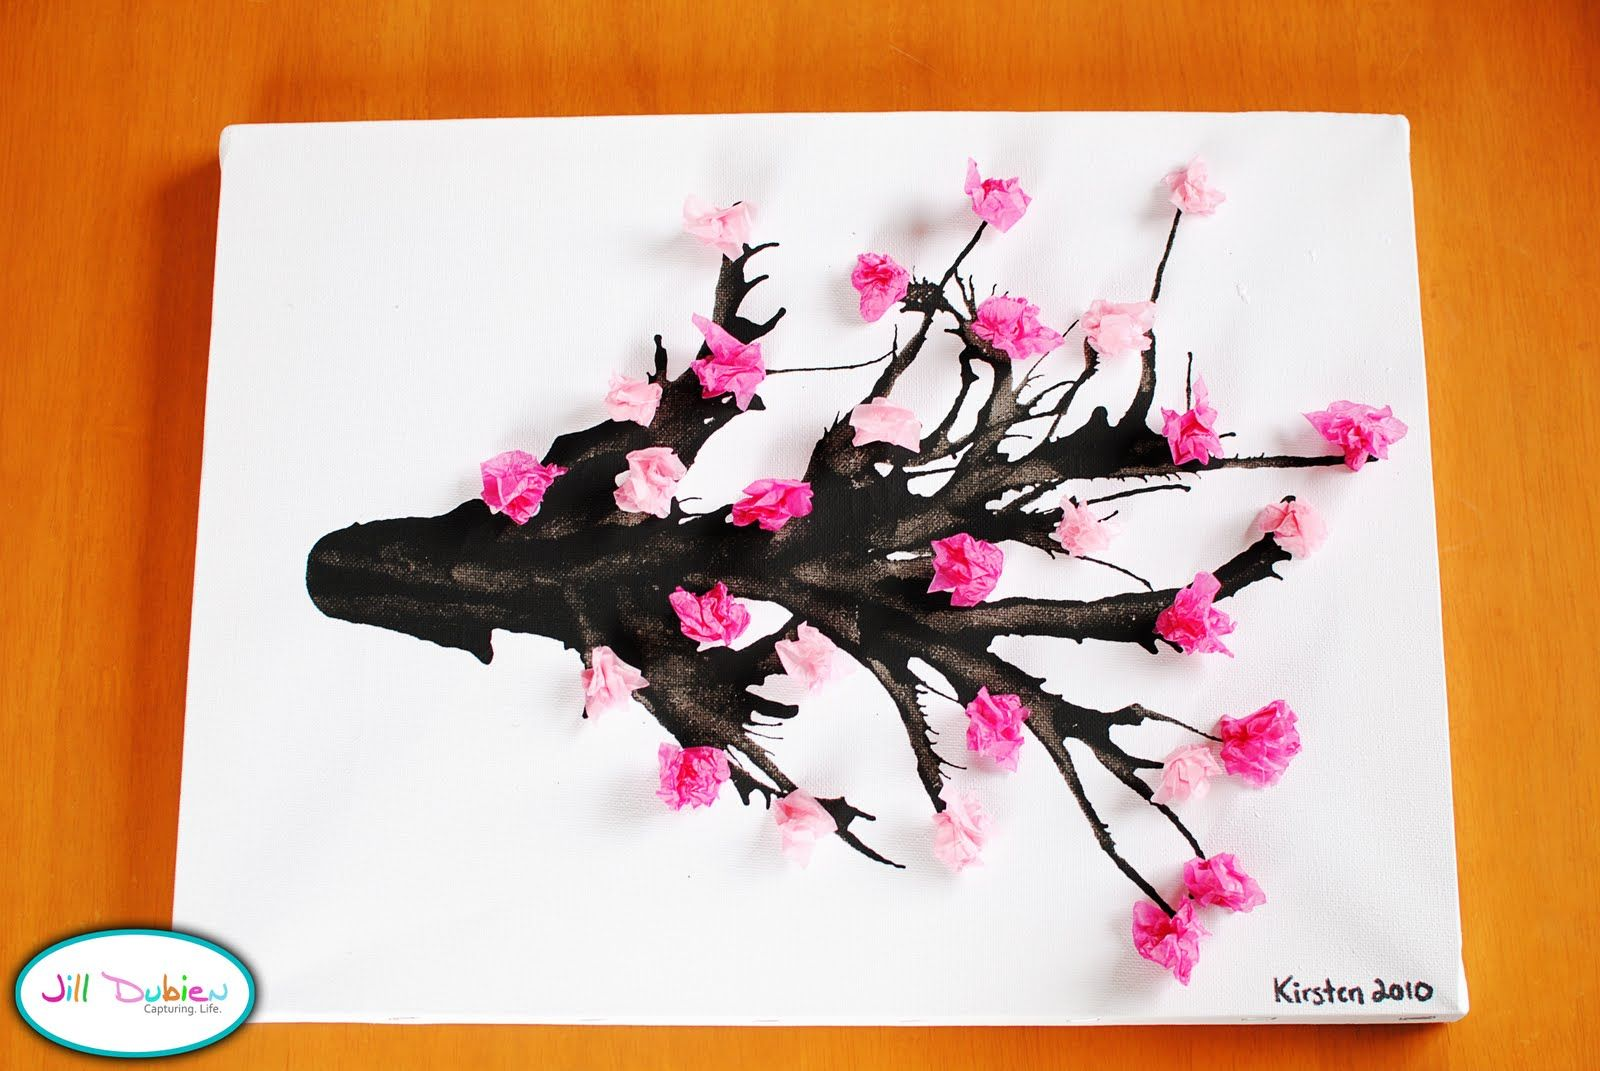 Pin By Trickyfish7 On Craft Ideas Spring Crafts Crafts Tree Crafts